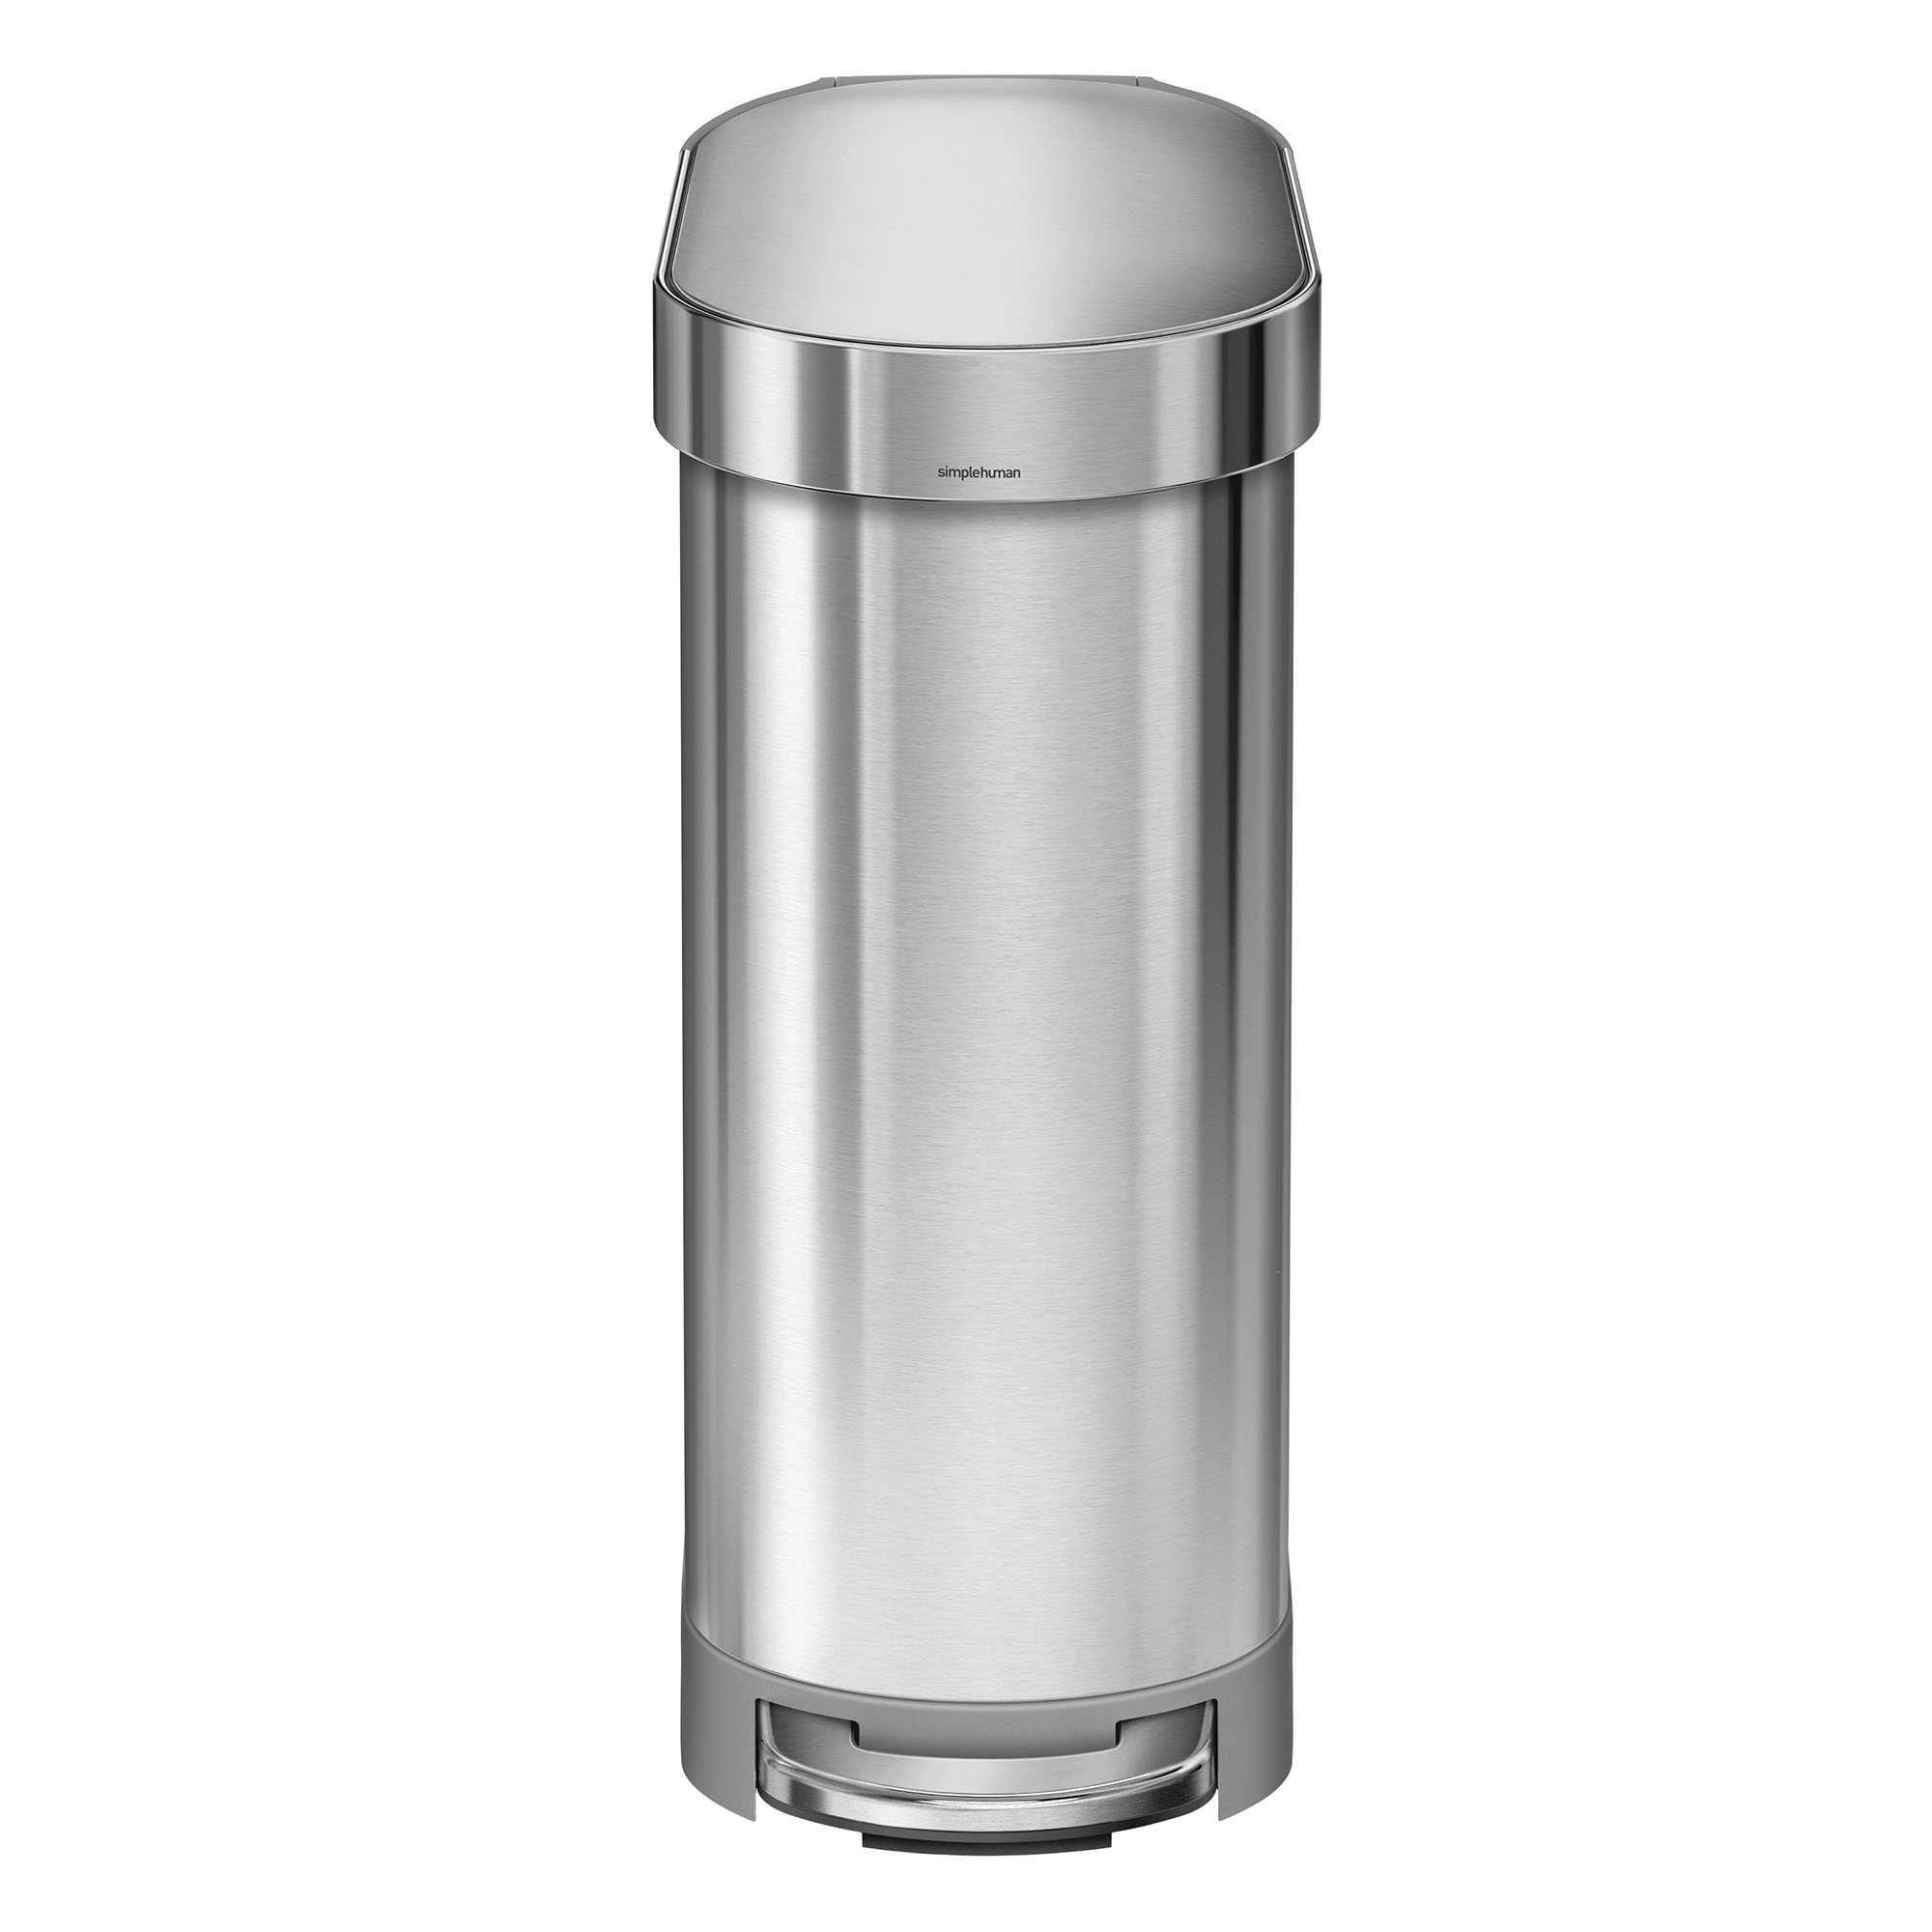 Simplehuman Slim 45 Liter Step On Trash Can With Liner Rim